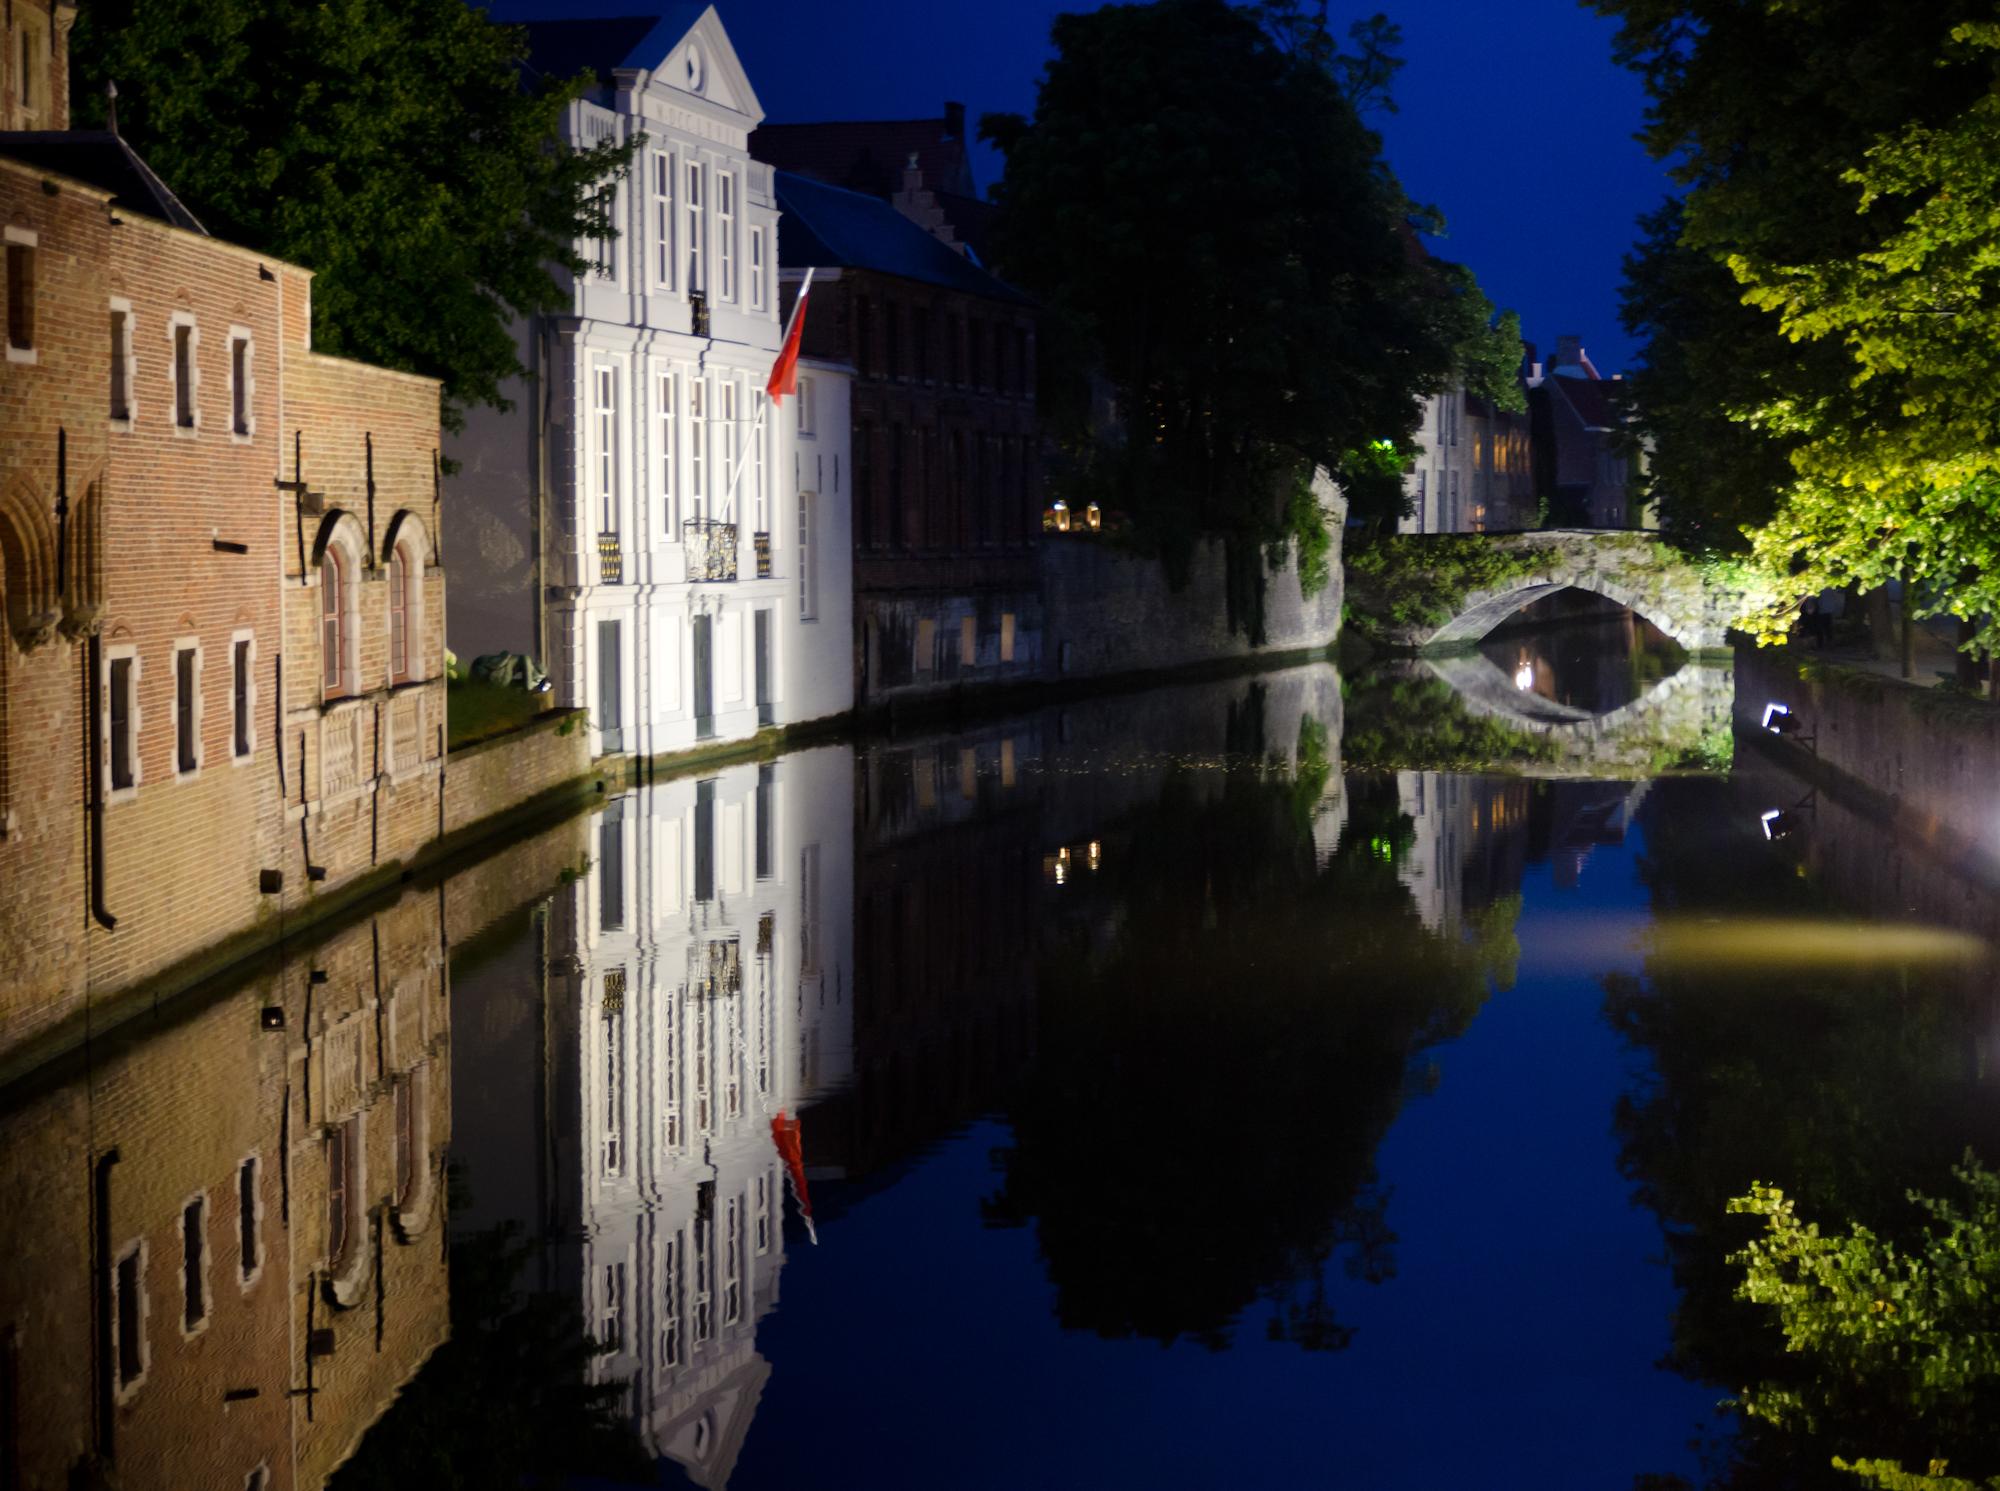 2012-08-13 68 Brugge